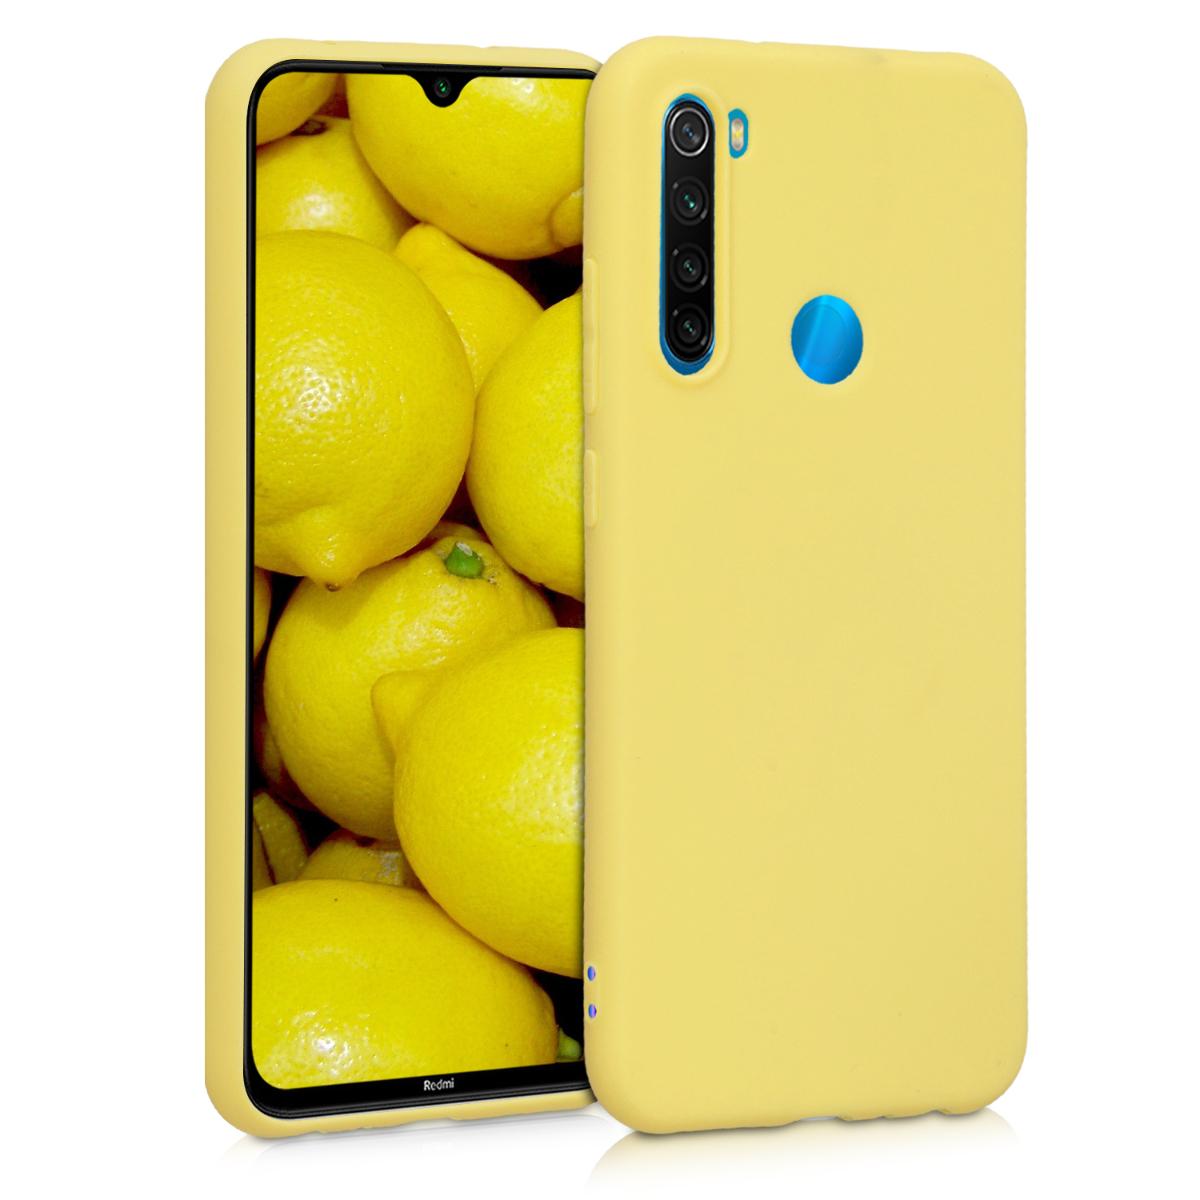 KW Θήκη Σιλικόνης Xiaomi Redmi Note 8 - Yellow Matte (50180.49)